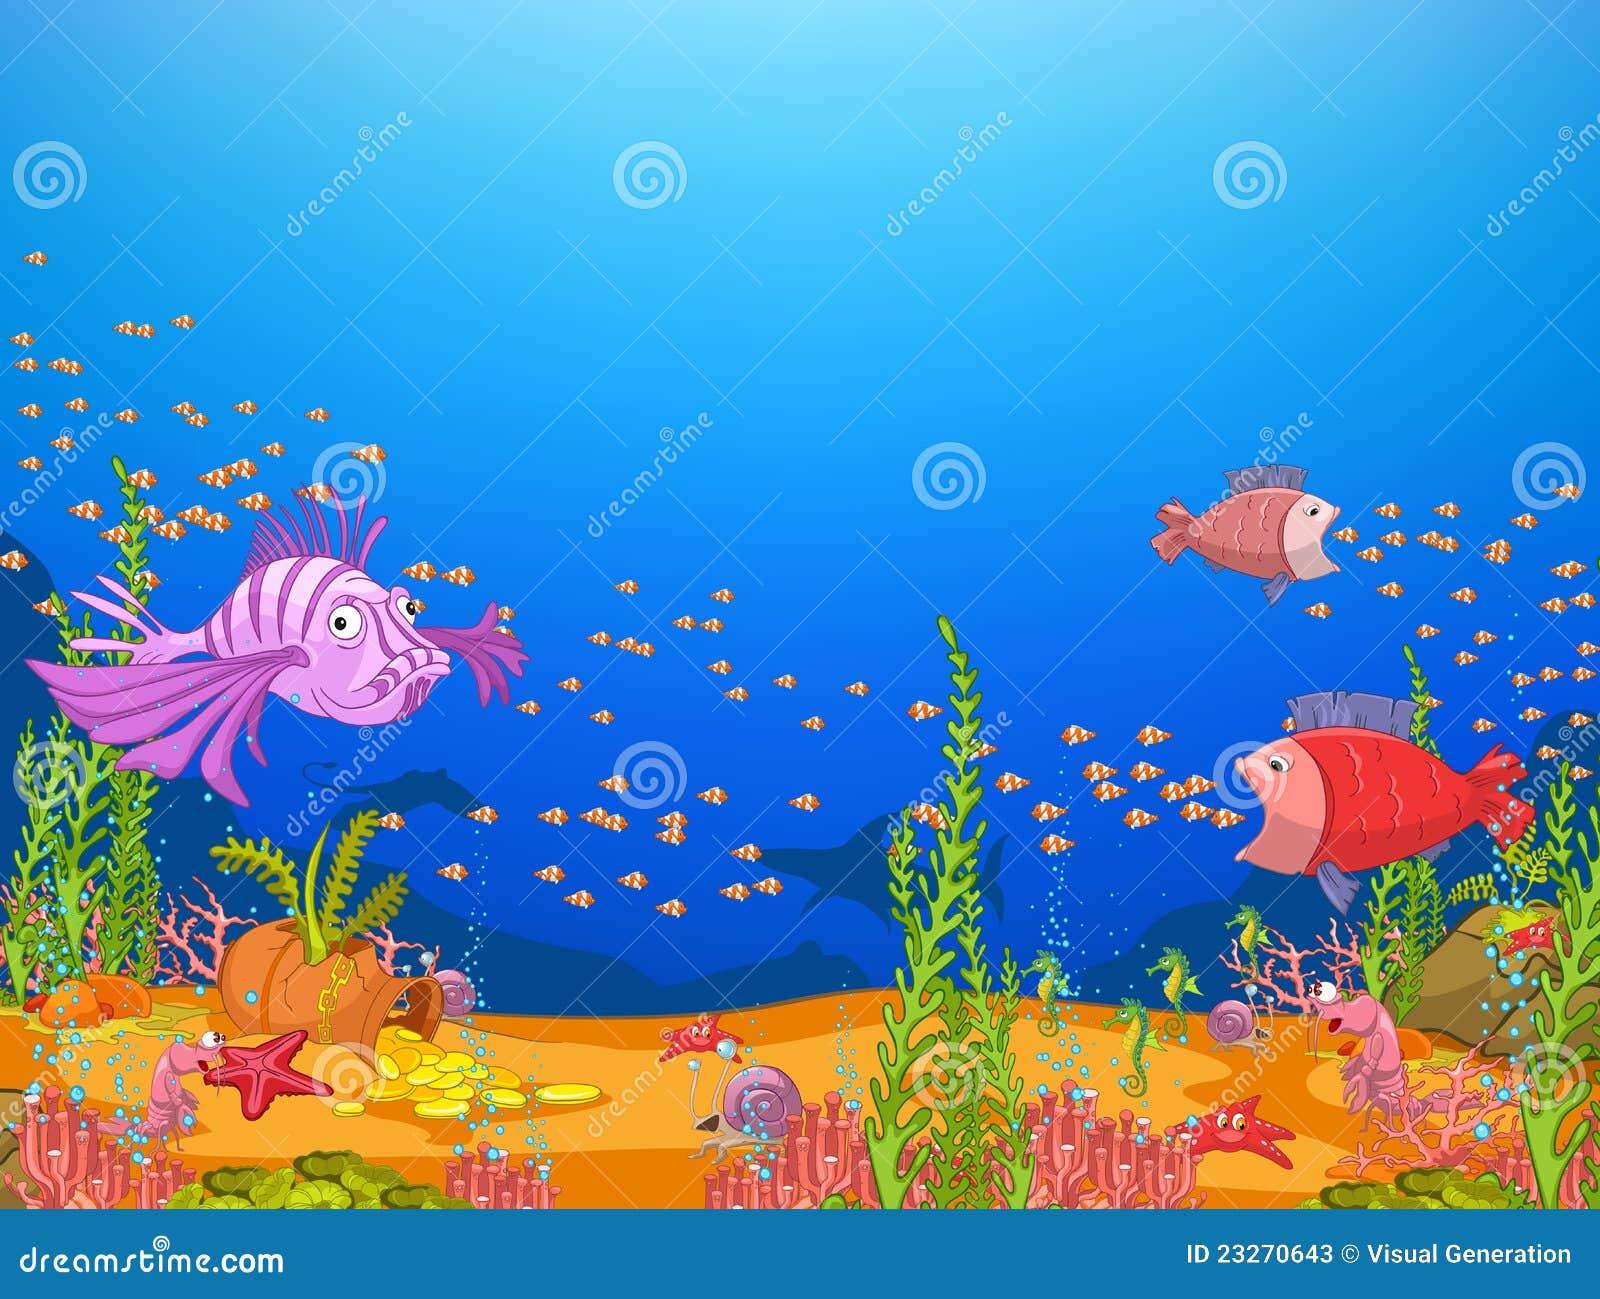 underwater cartoon wallpaper - photo #19